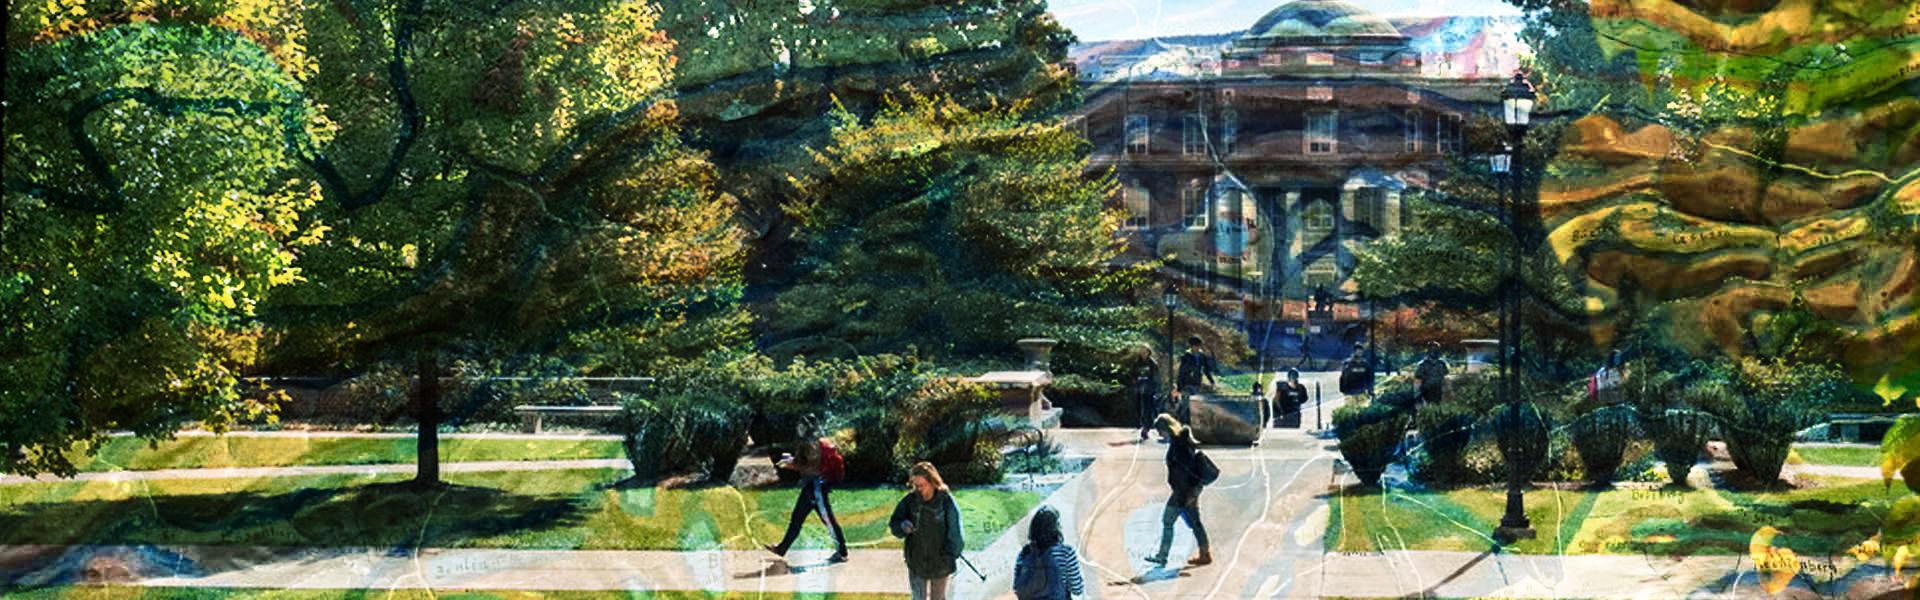 West Halls Campus